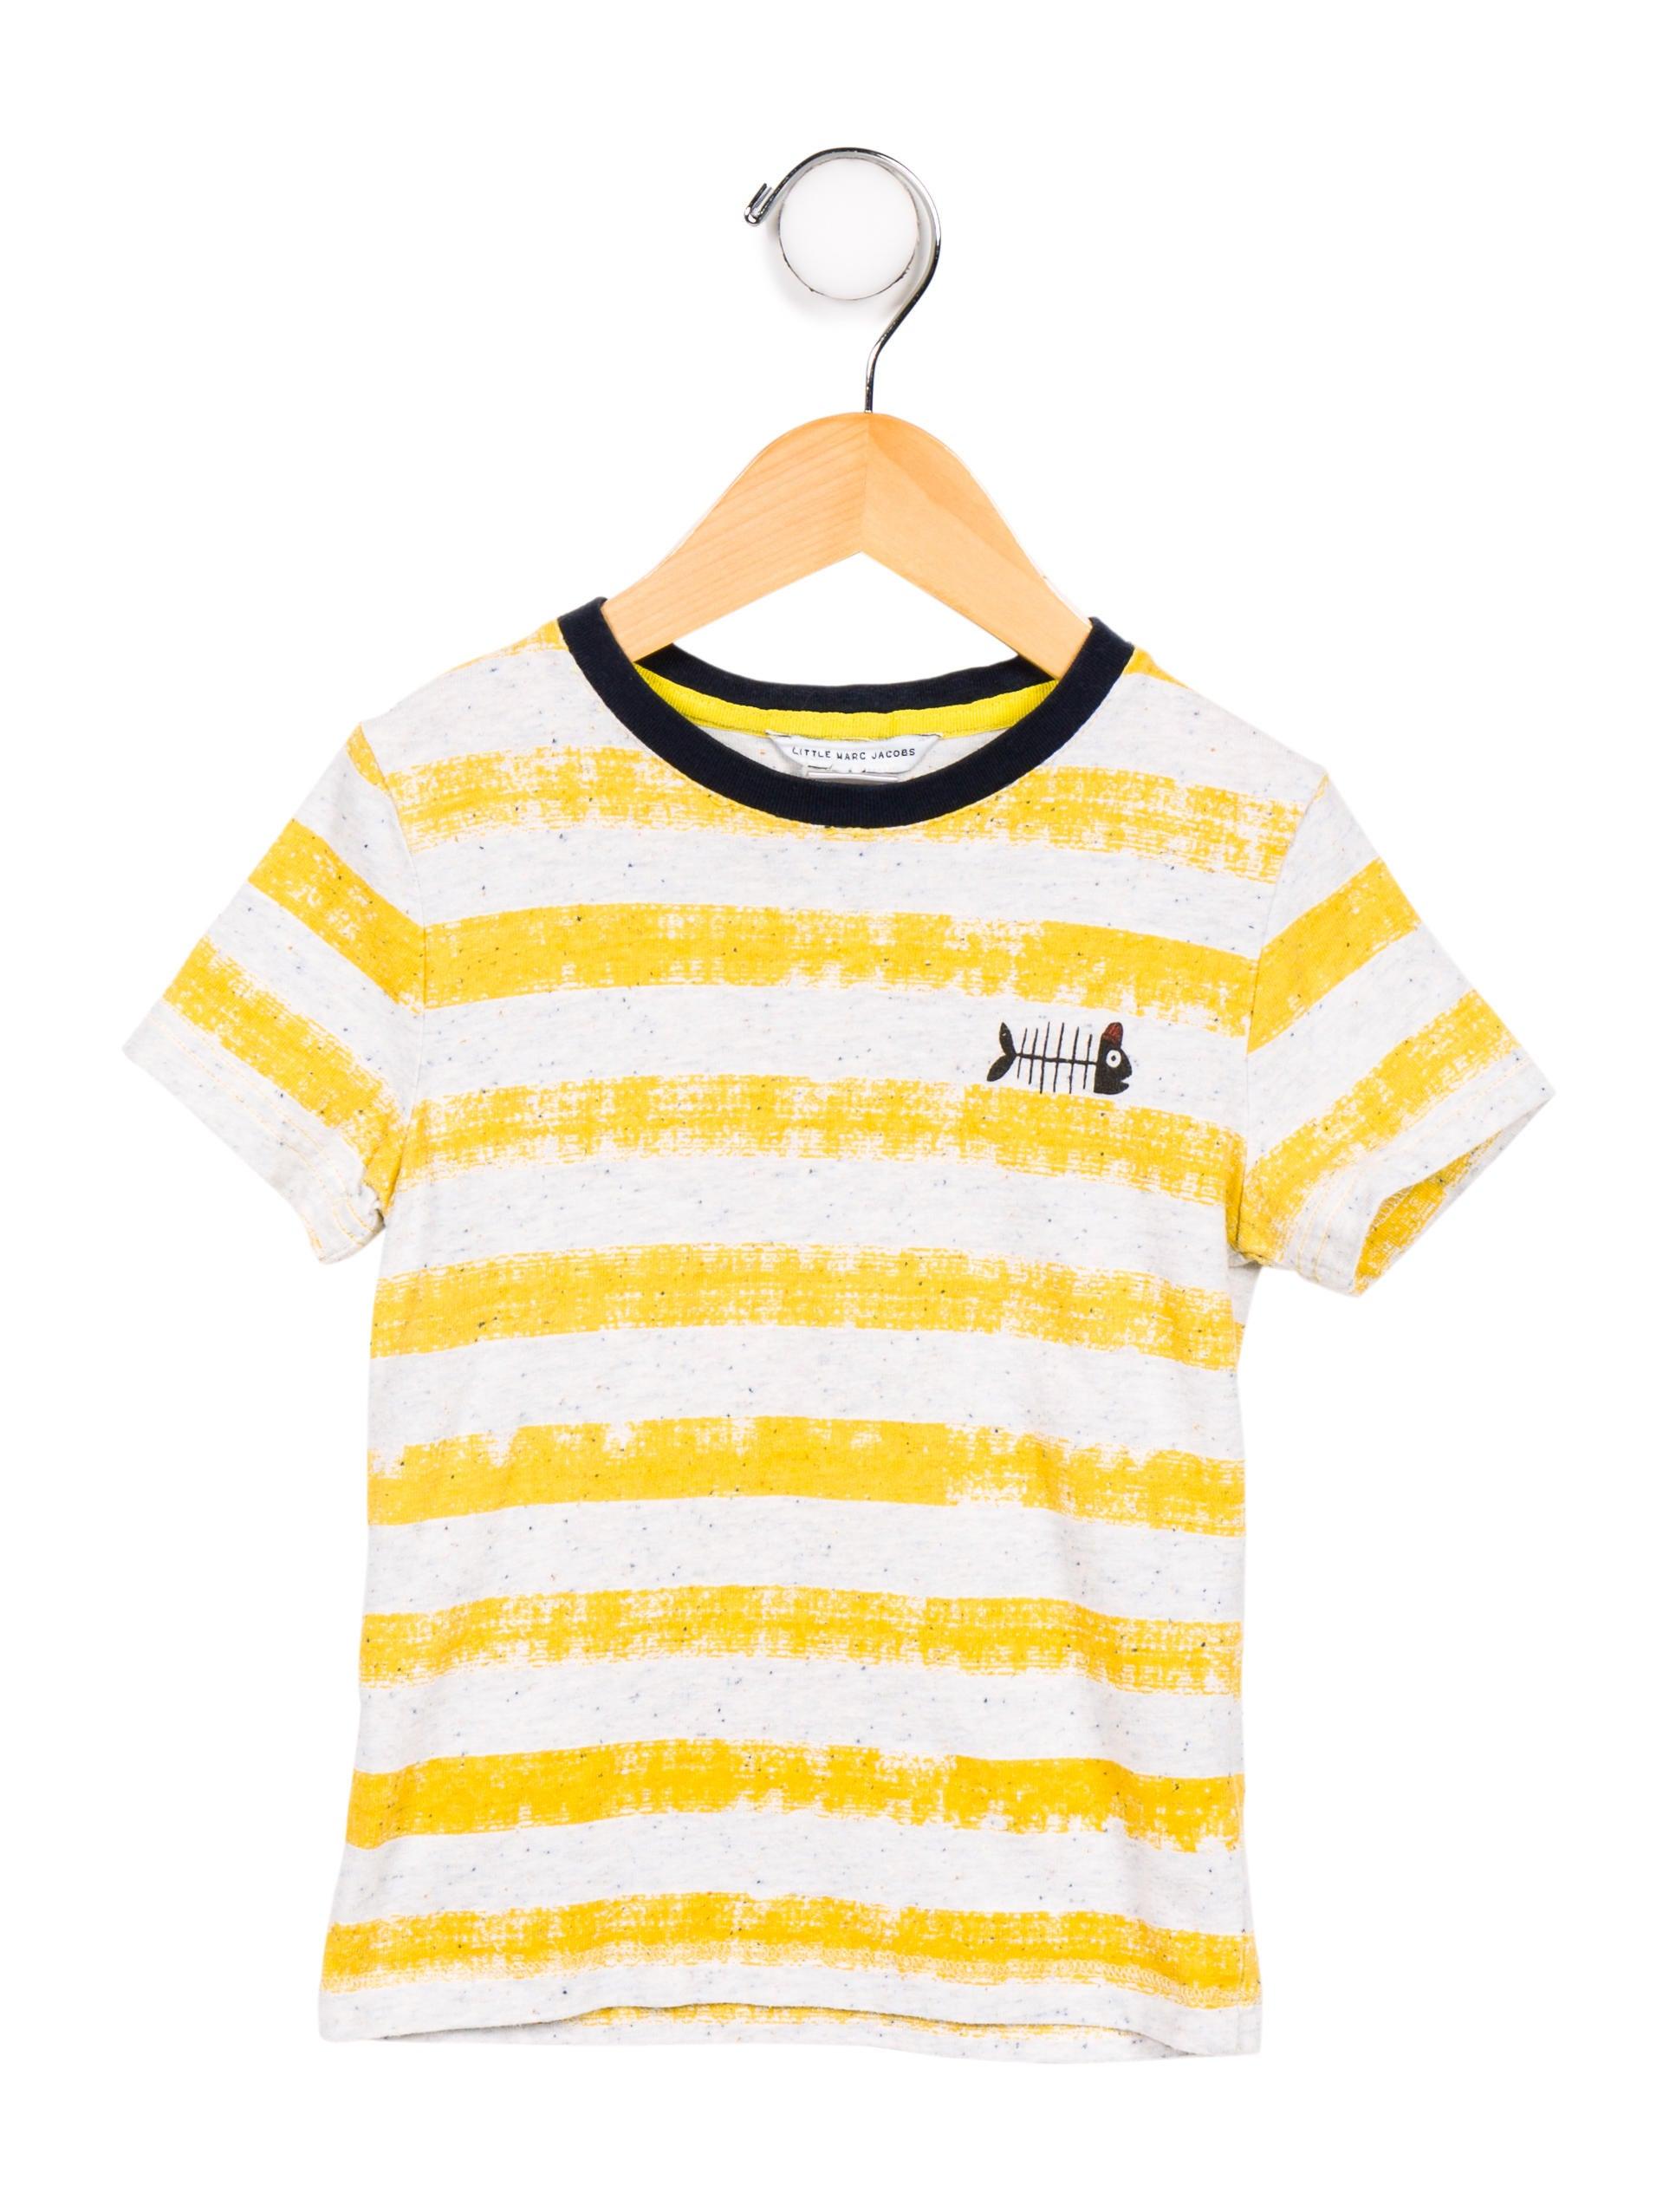 71a8c65a8 Little Marc Jacobs Boys' Striped T-Shirt - Boys - WLIMJ21782   The ...